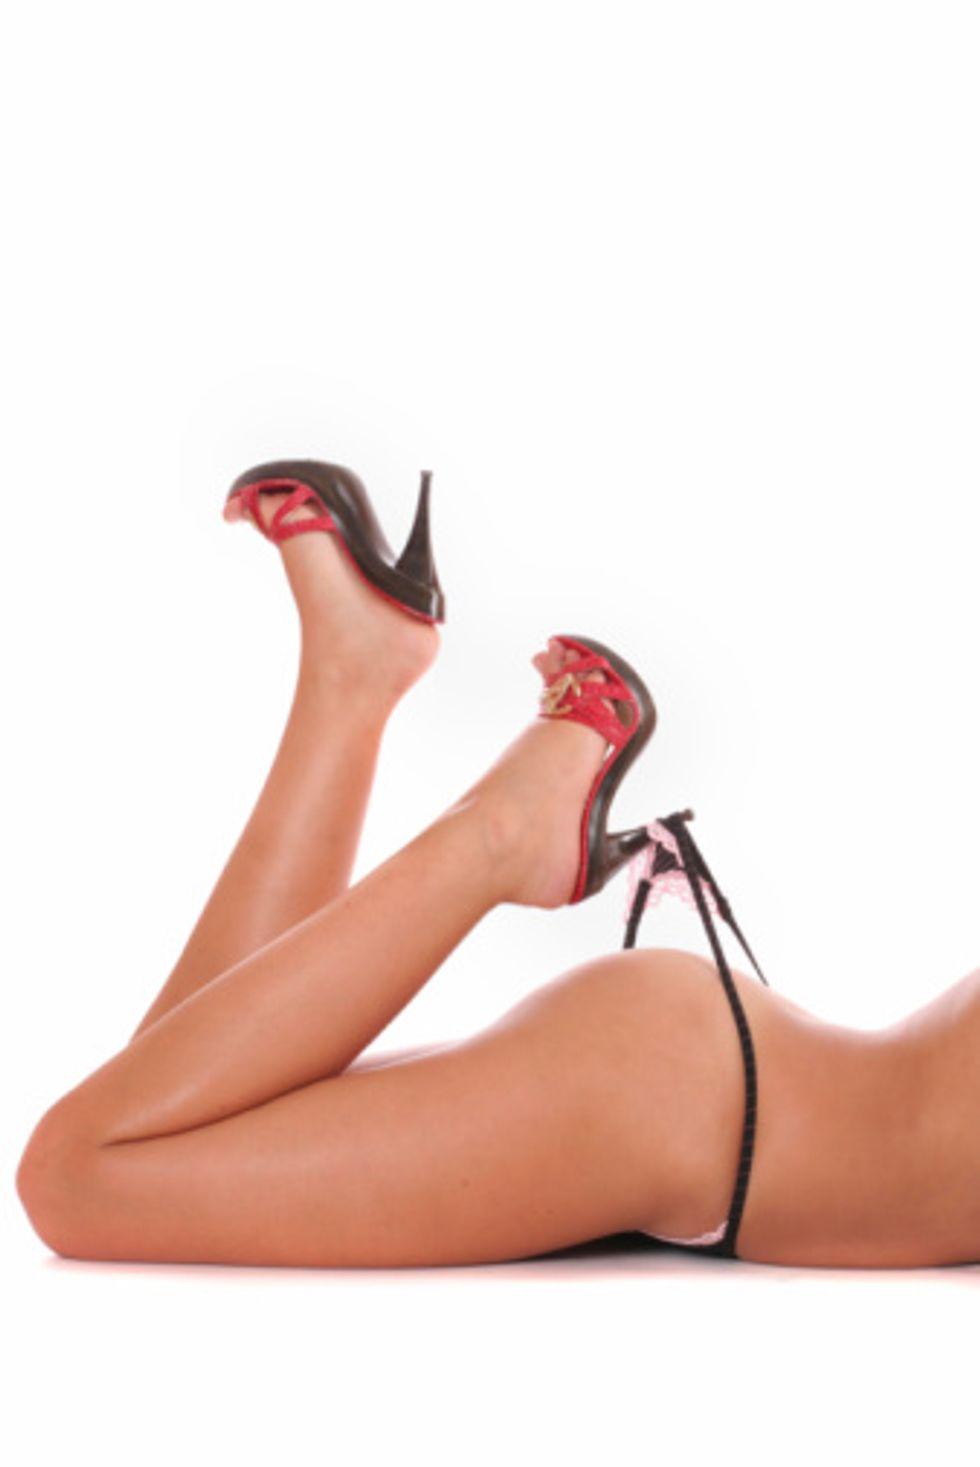 L'industria del porno dice addio a Los Angeles